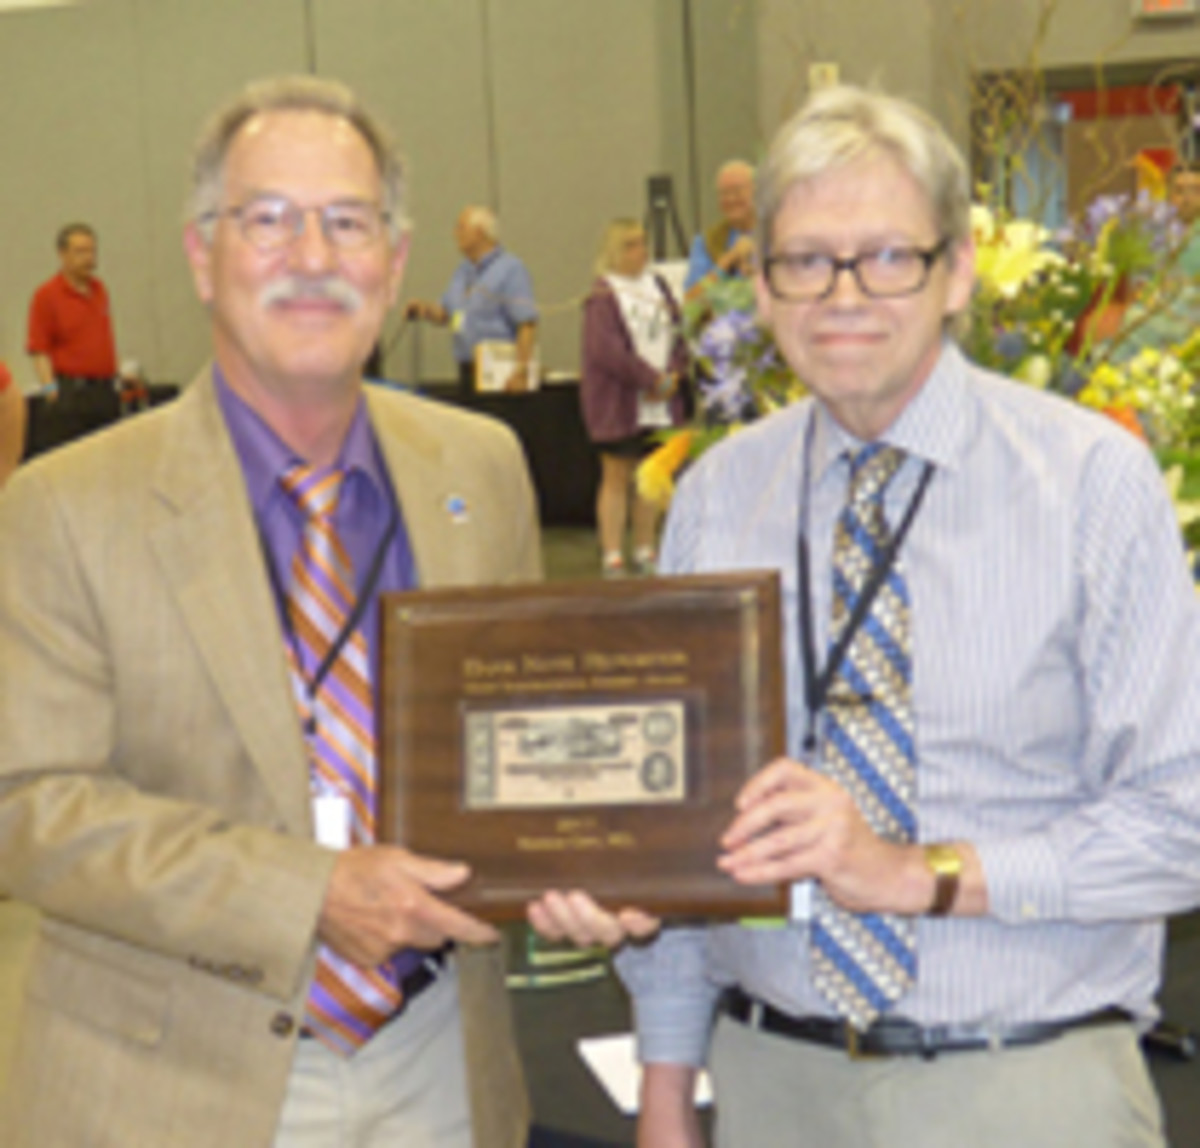 Michael McNeil, left, won the Bank Note Reporter Most Inspirational Exhibit Award. Presenting is BNR editor Robert R. Van Ryzin.